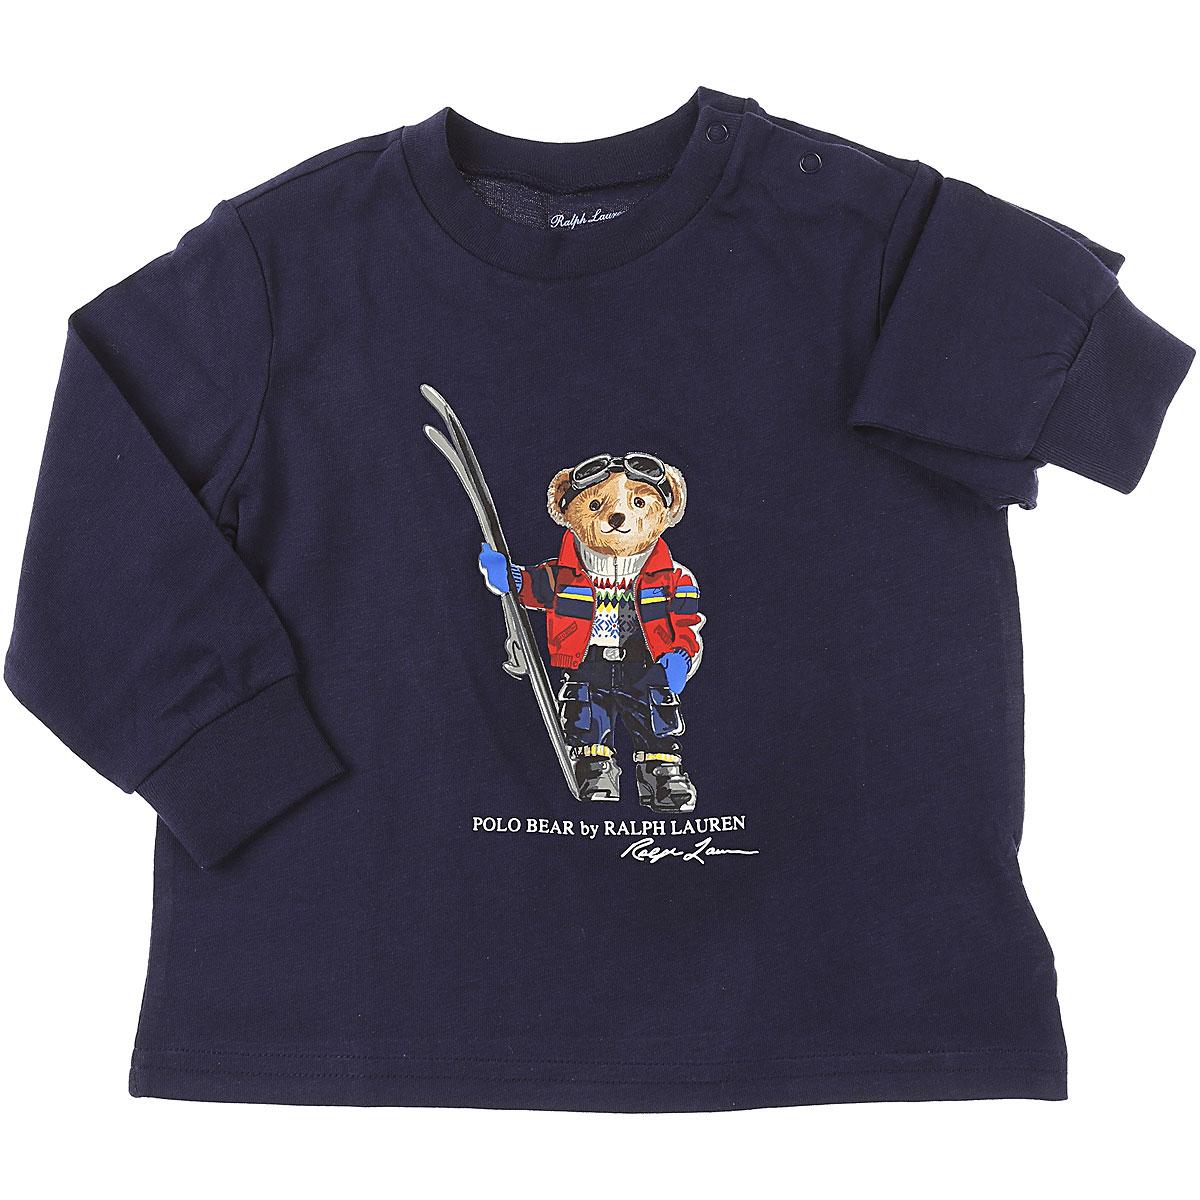 Ralph Lauren Baby T-Shirt for Boys On Sale, navy, Cotton, 2019, 12 M 3M 6M 9M